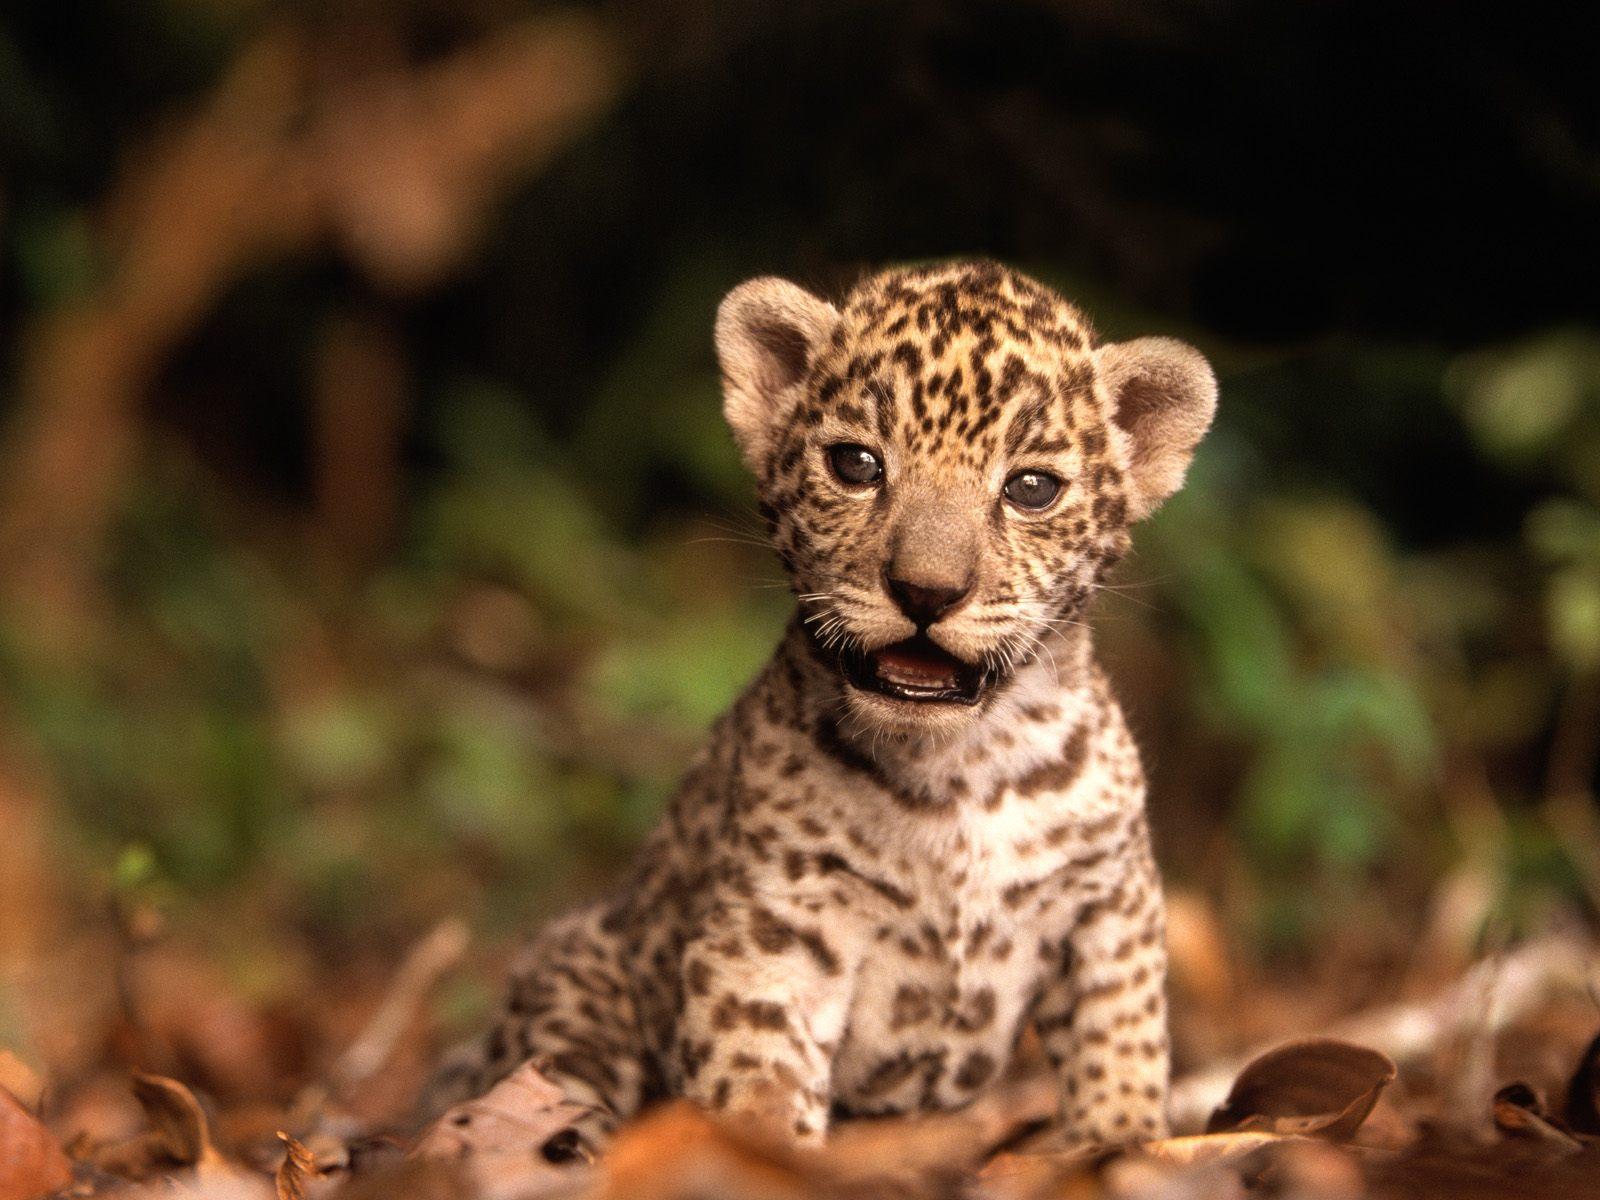 Beautiful Wallpapers: baby cheetah wallpaper